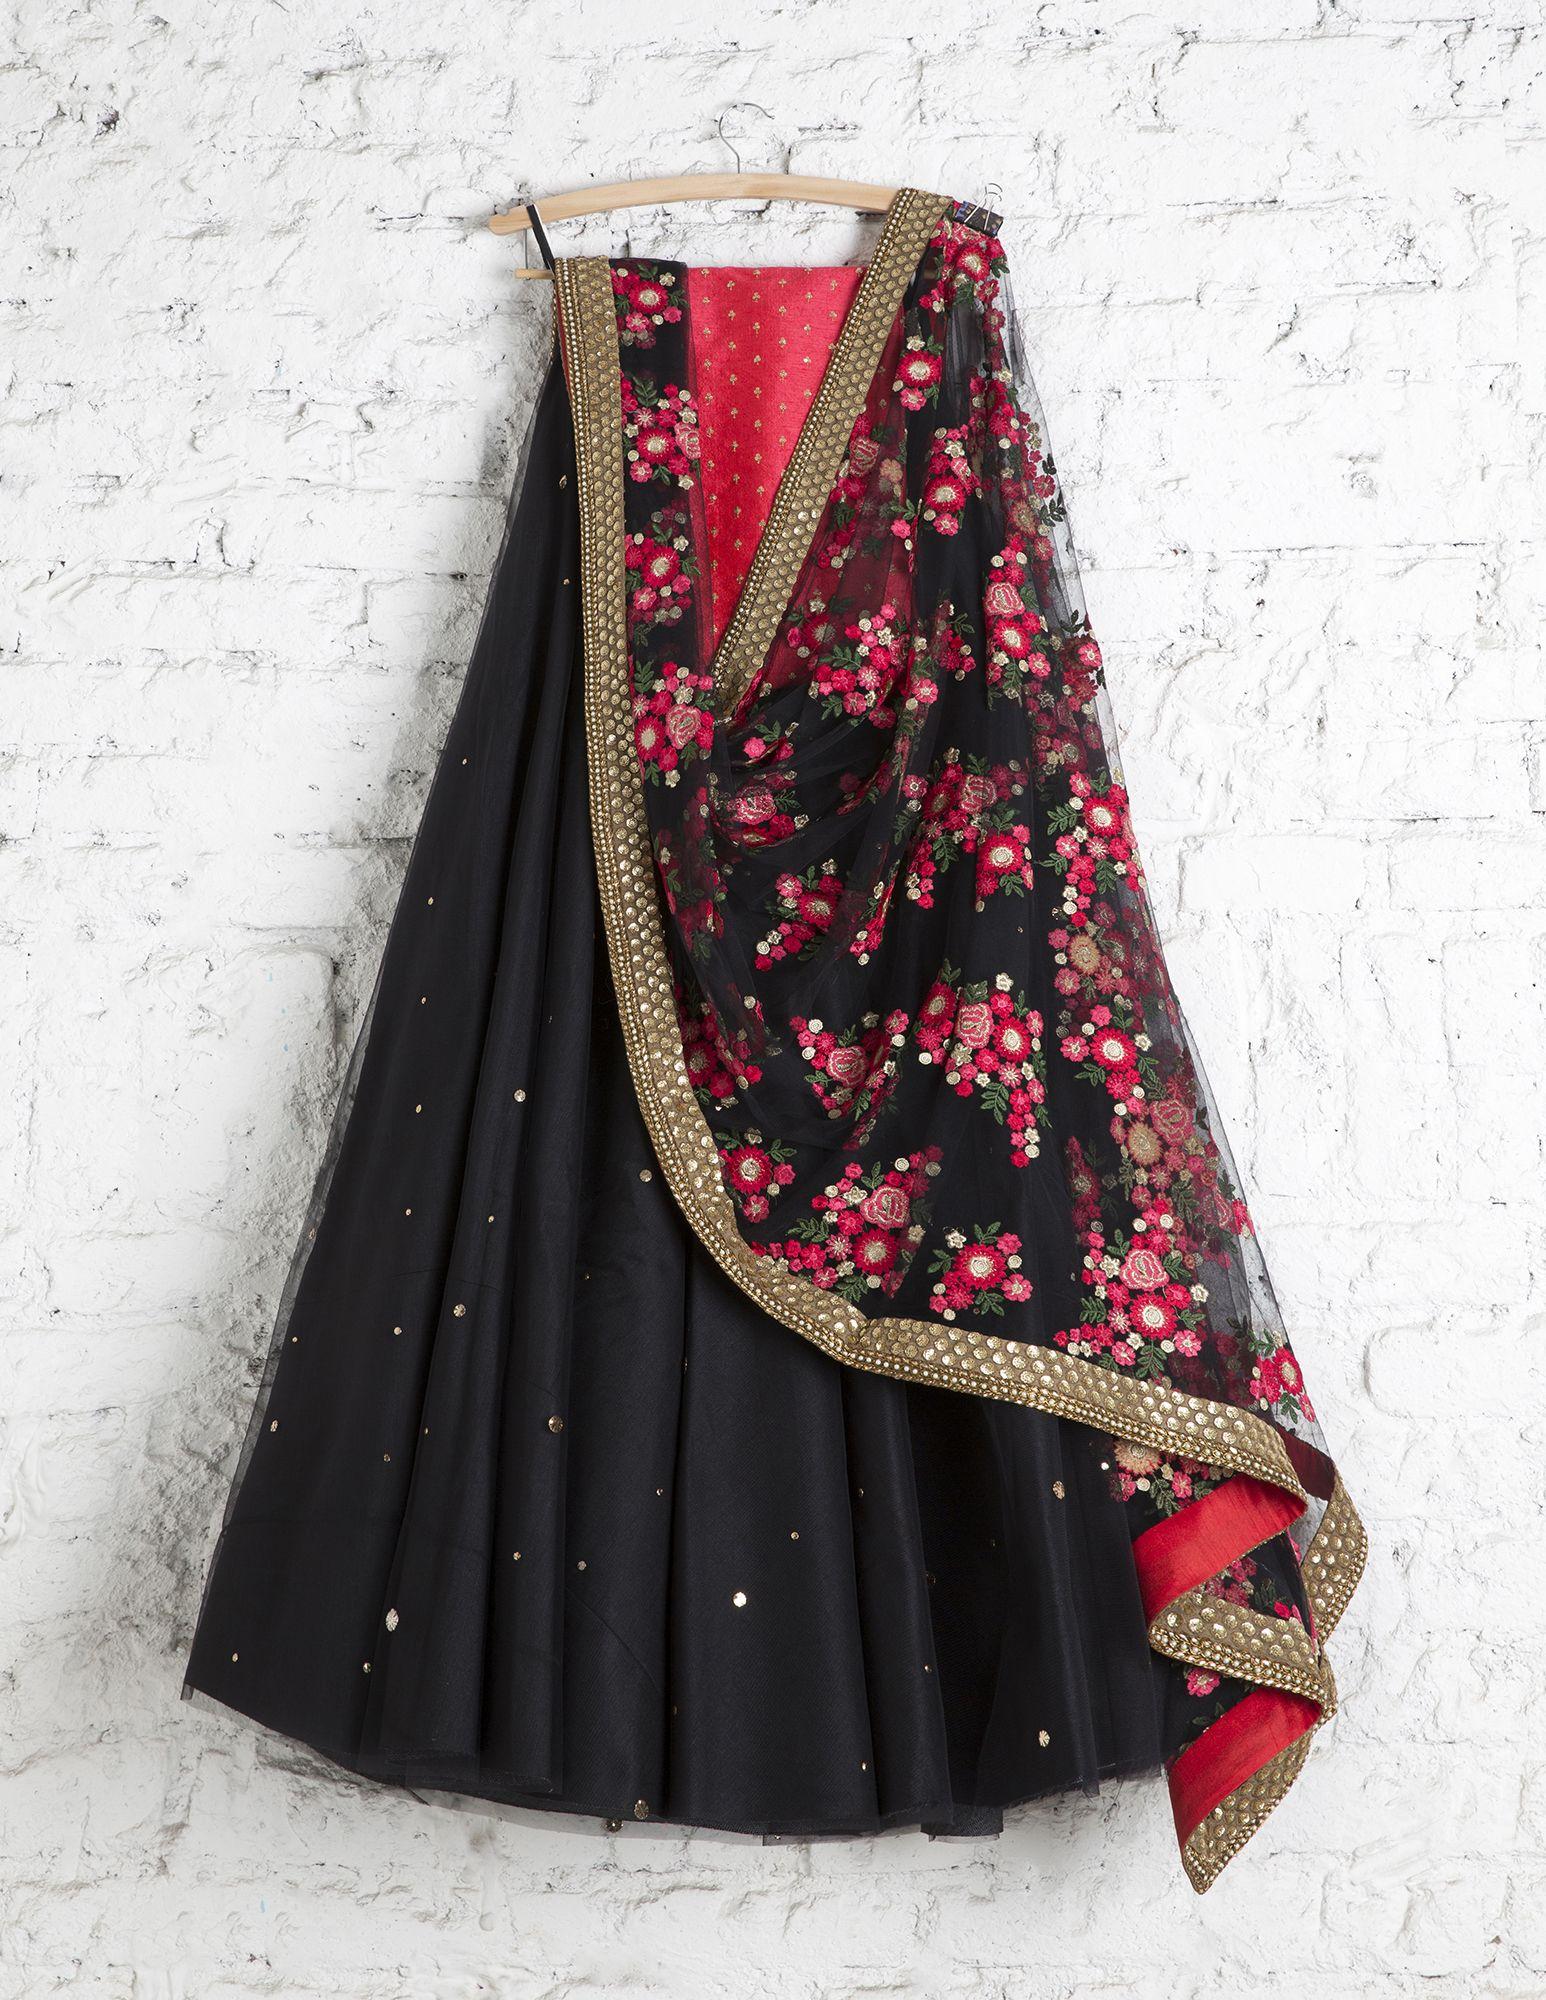 87f0a2f16 SwatiManish Lehengas SMF LEH 182 17 Black badla lehenga with floral  threadwork dupatta coral sequin blouse